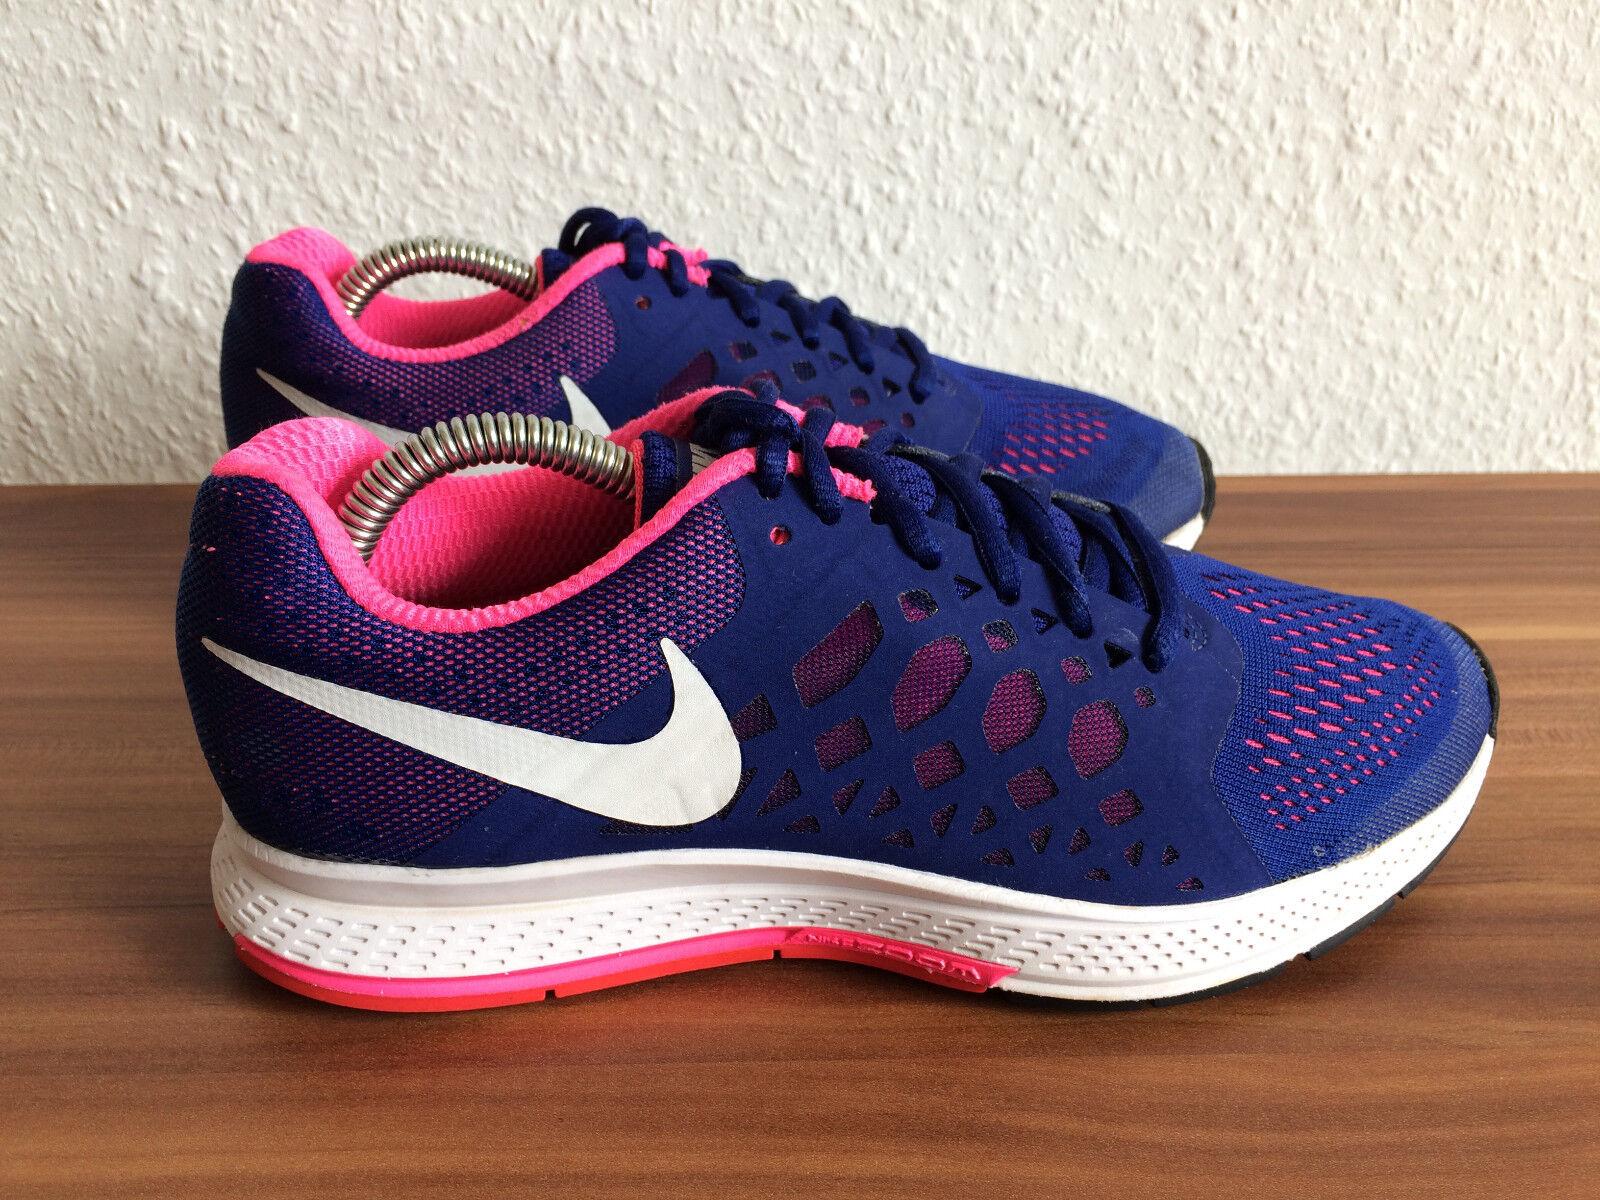 Super Nike Air Zoom Pegasus Laufschuhe 31 Sneaker Schuhe Sportschuhe Laufschuhe Pegasus Gr. 38 Top 2ff52e